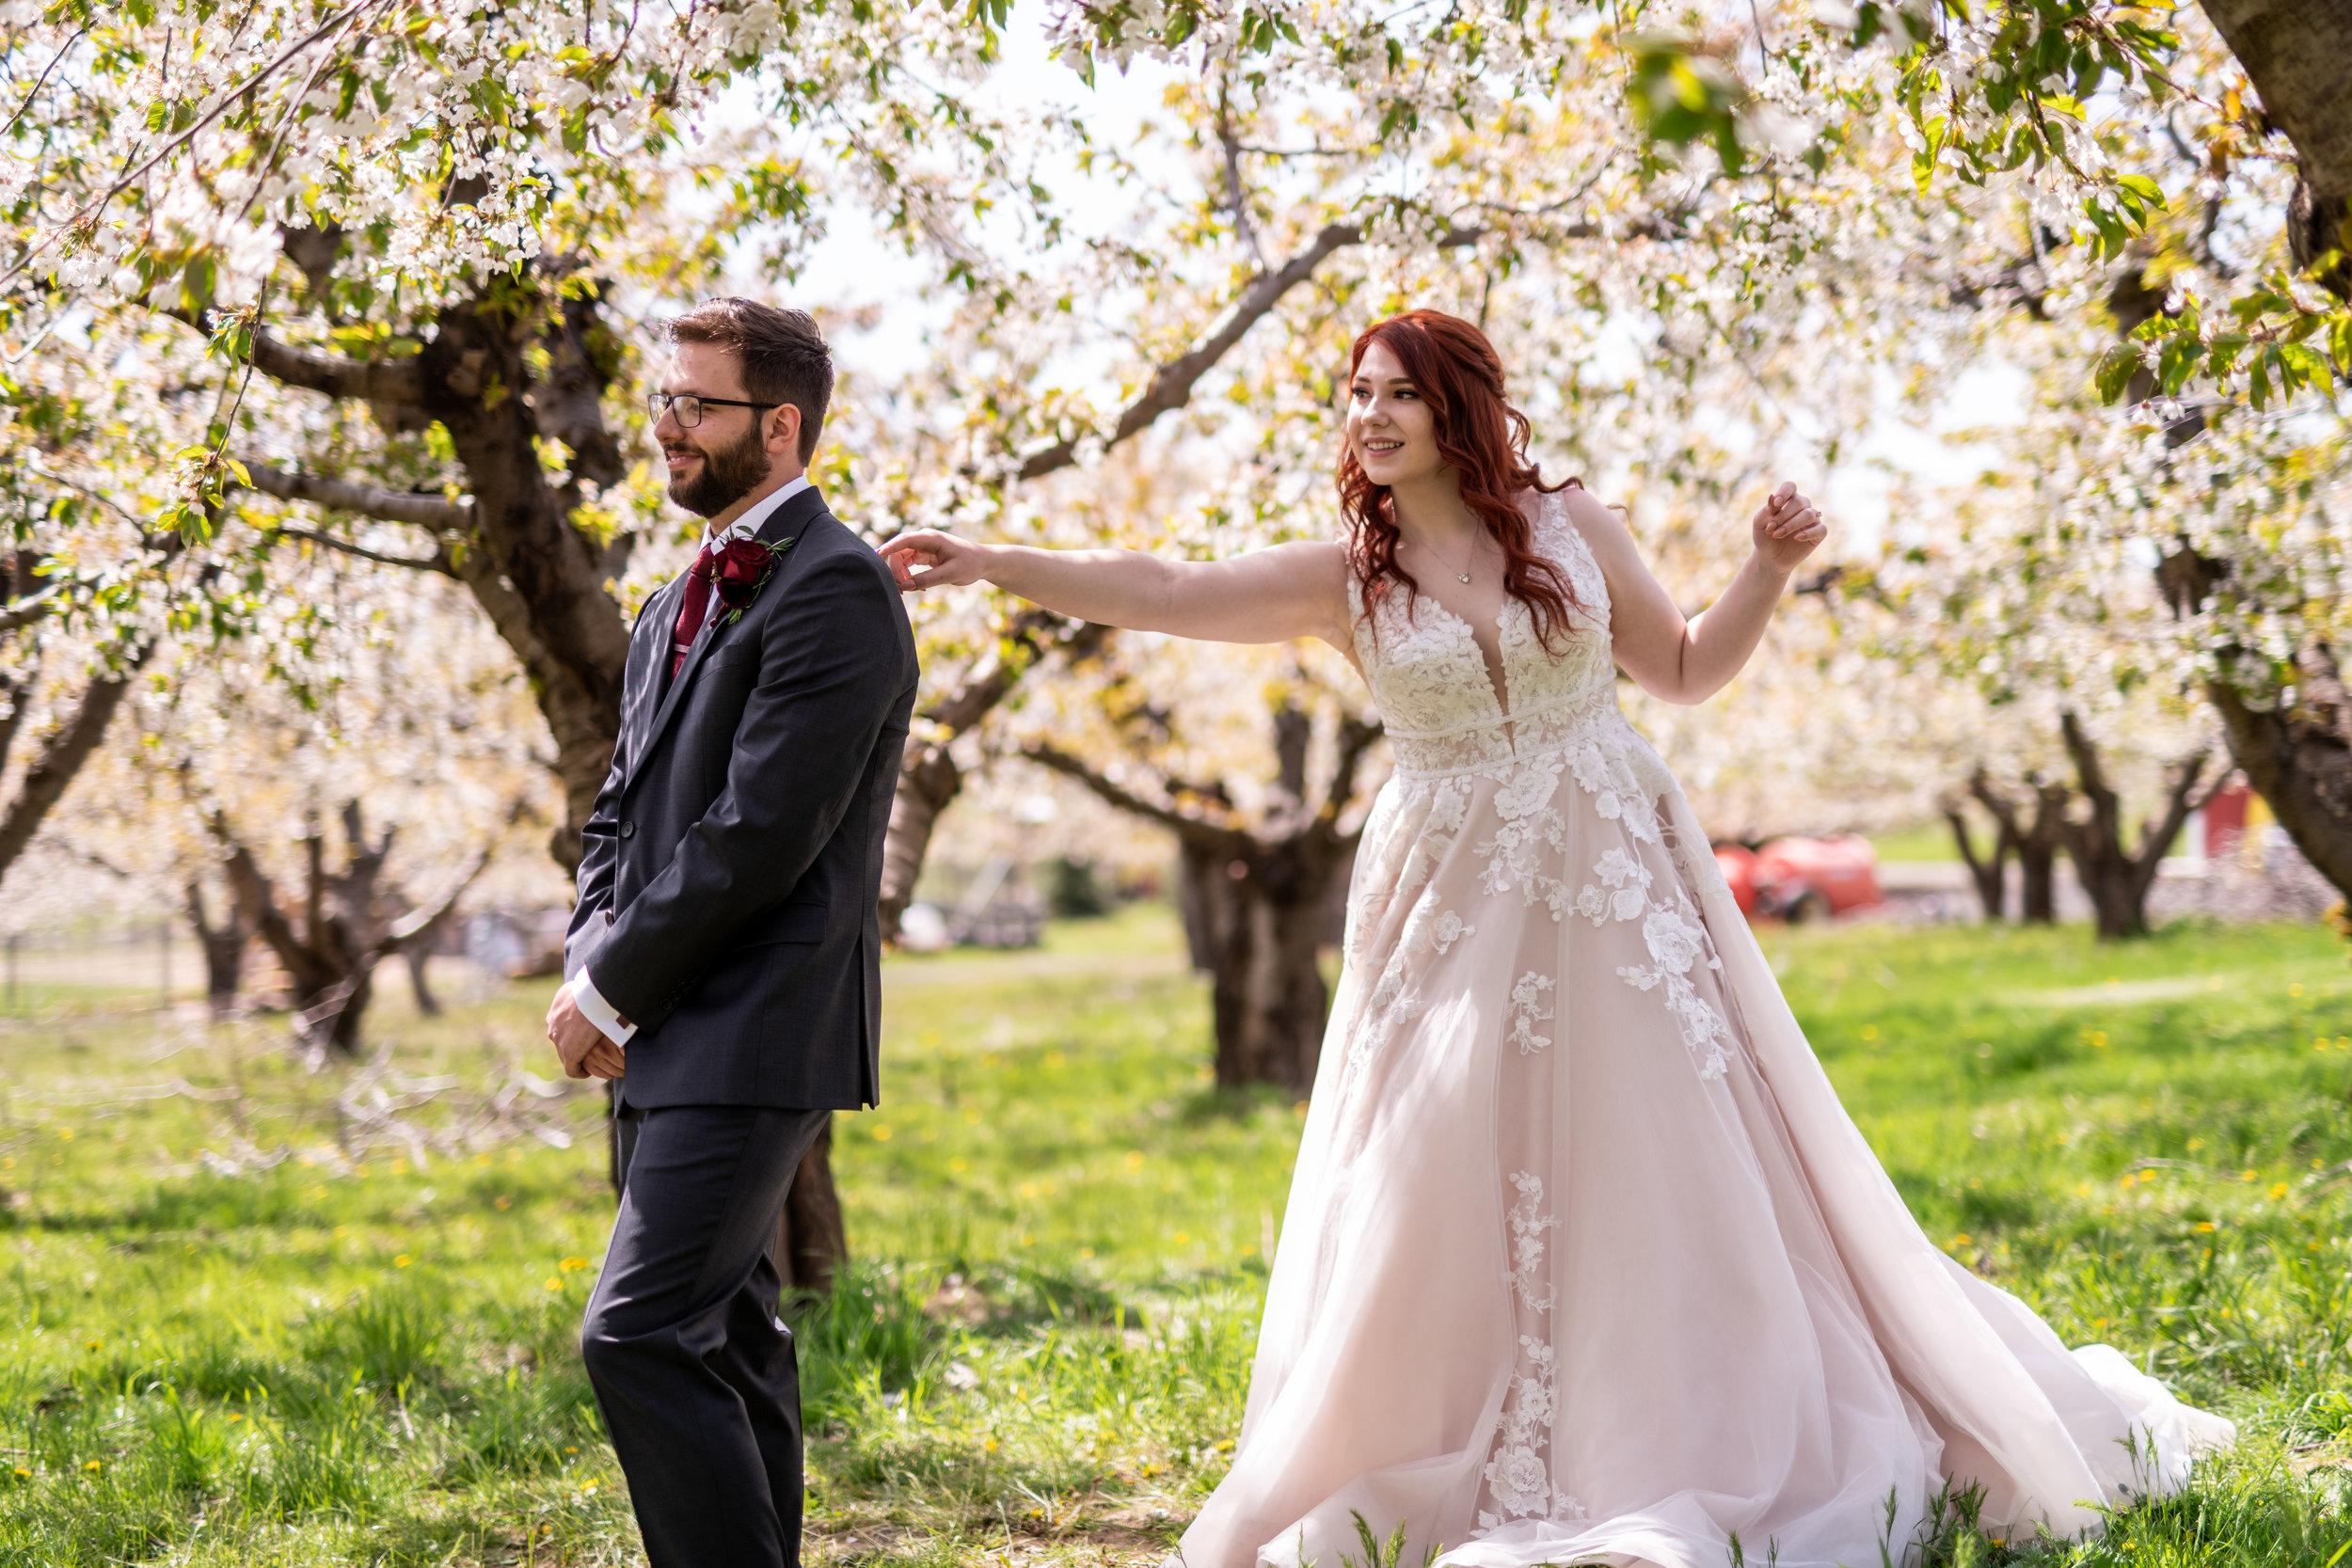 Spokane green bluff wedding dress bride first look